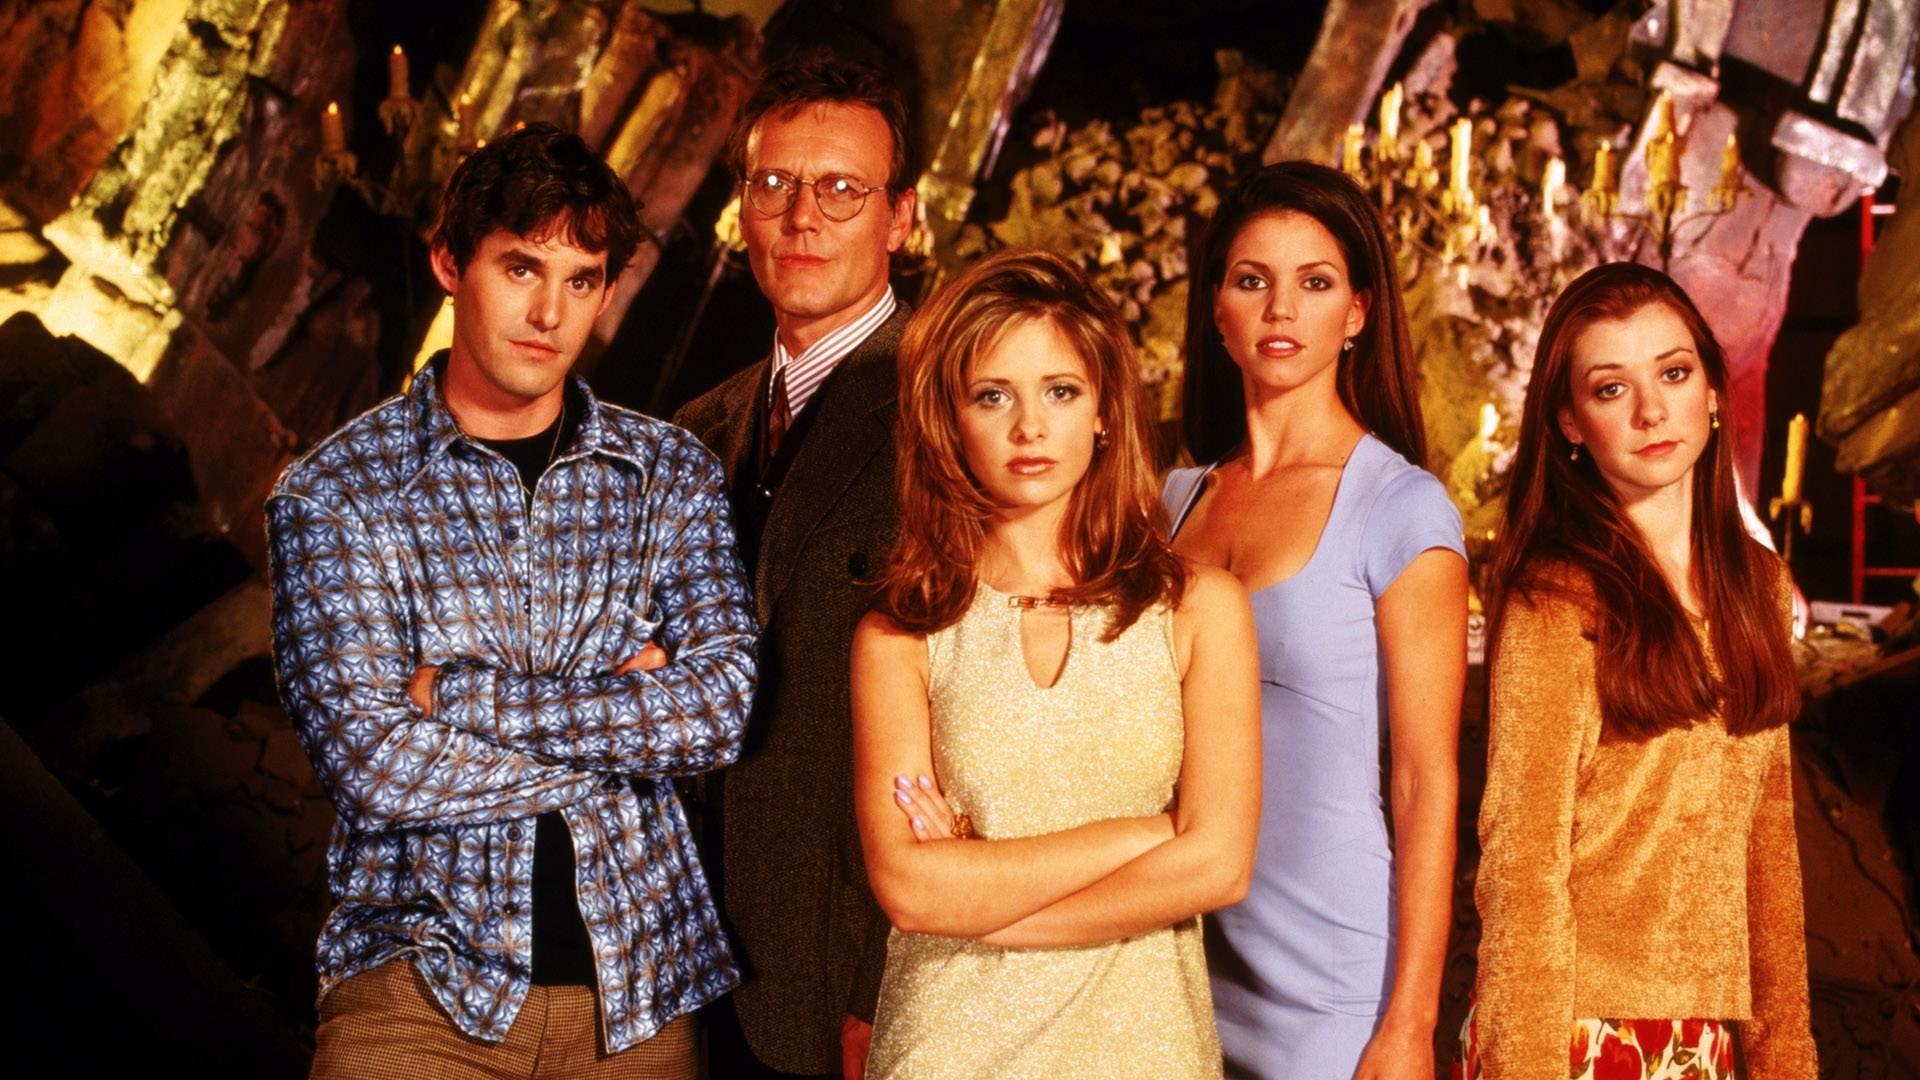 Buffy The Vampire Slayer Tv Show Wallpapers 1920x1080 Full Hd